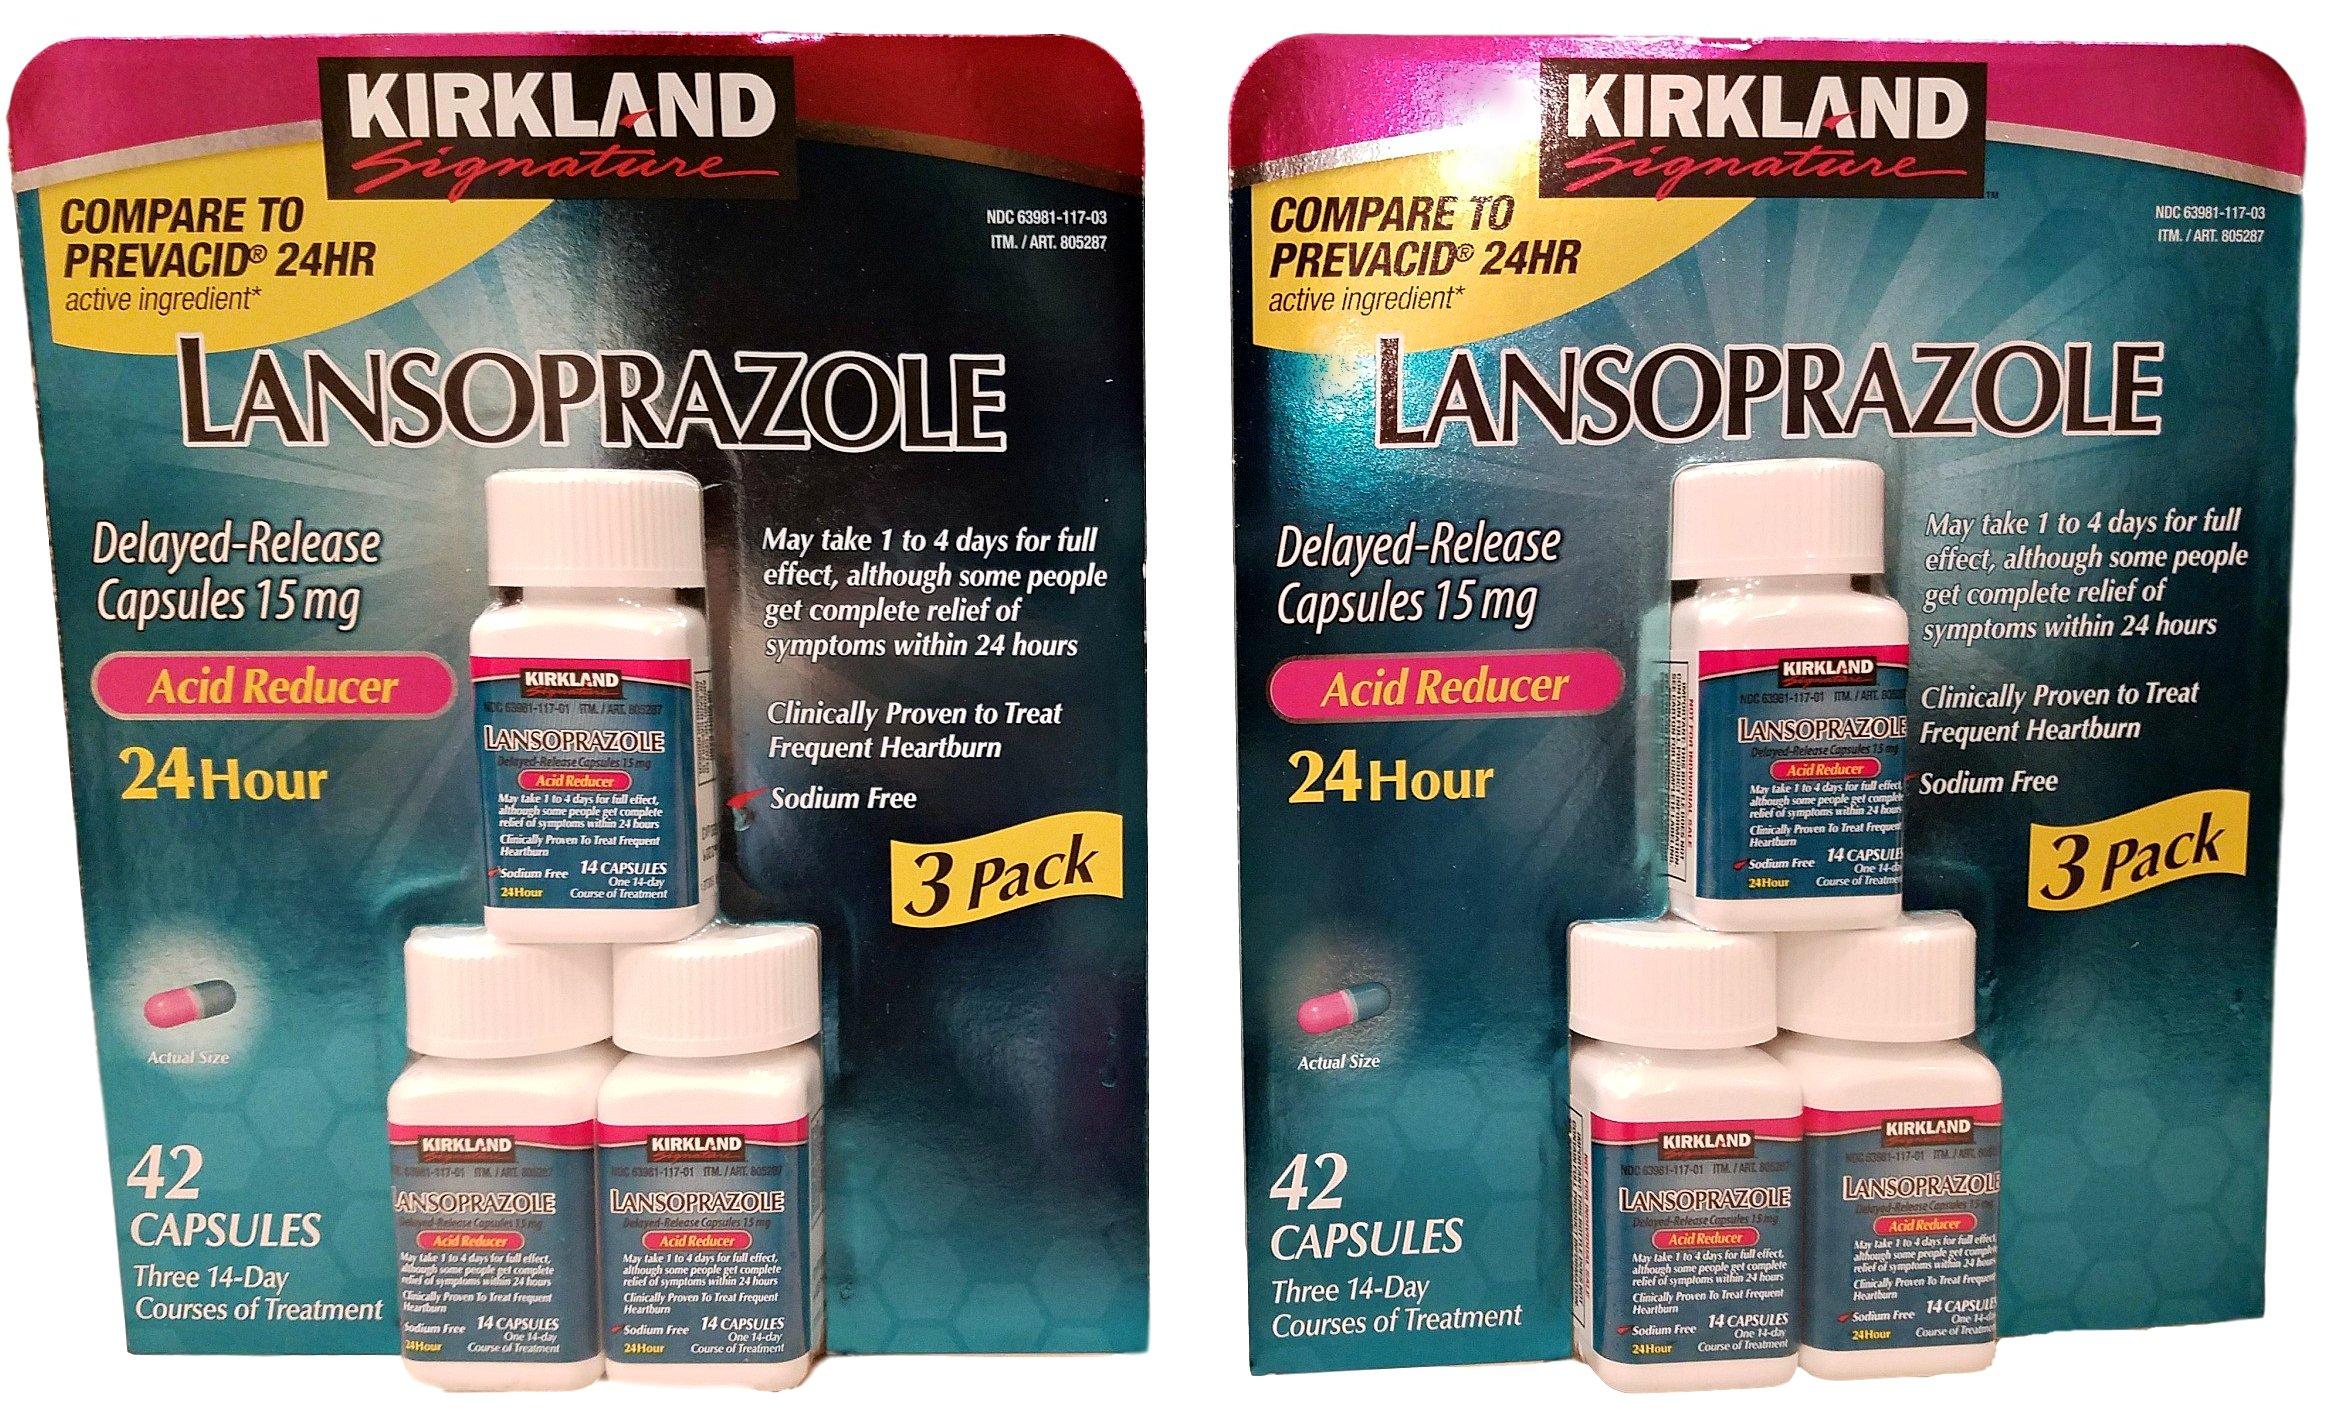 Kirkland Lansoprazole 3 Pack Delayed-Release Total 84 Capsules by Kirkland Signature